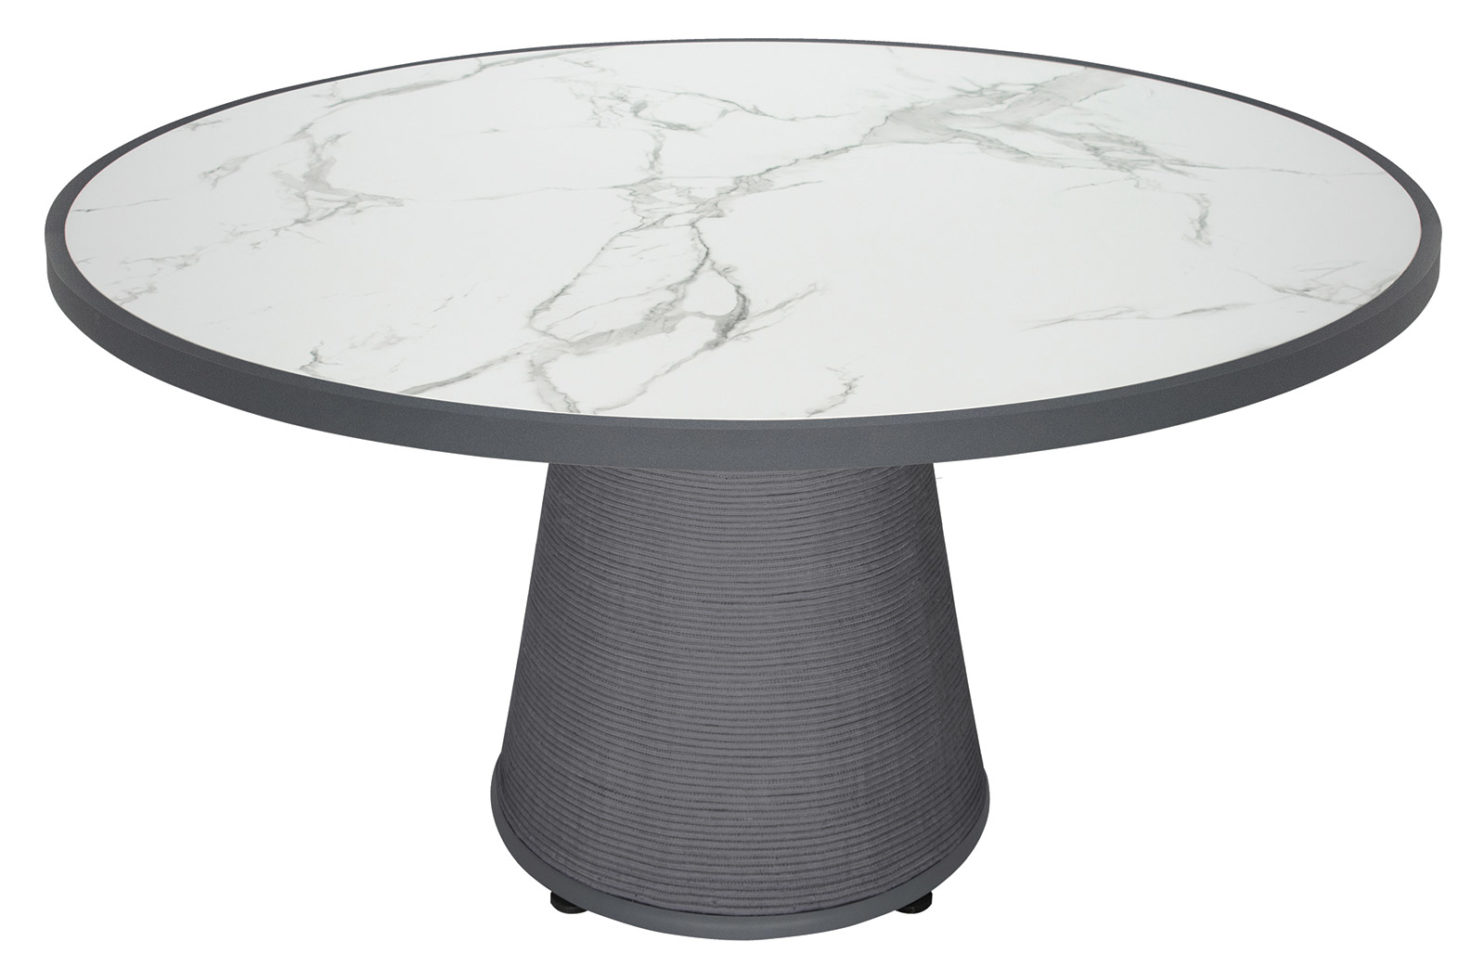 Archipelago alexander table 620FT100P2BBT DWA 1 3Q